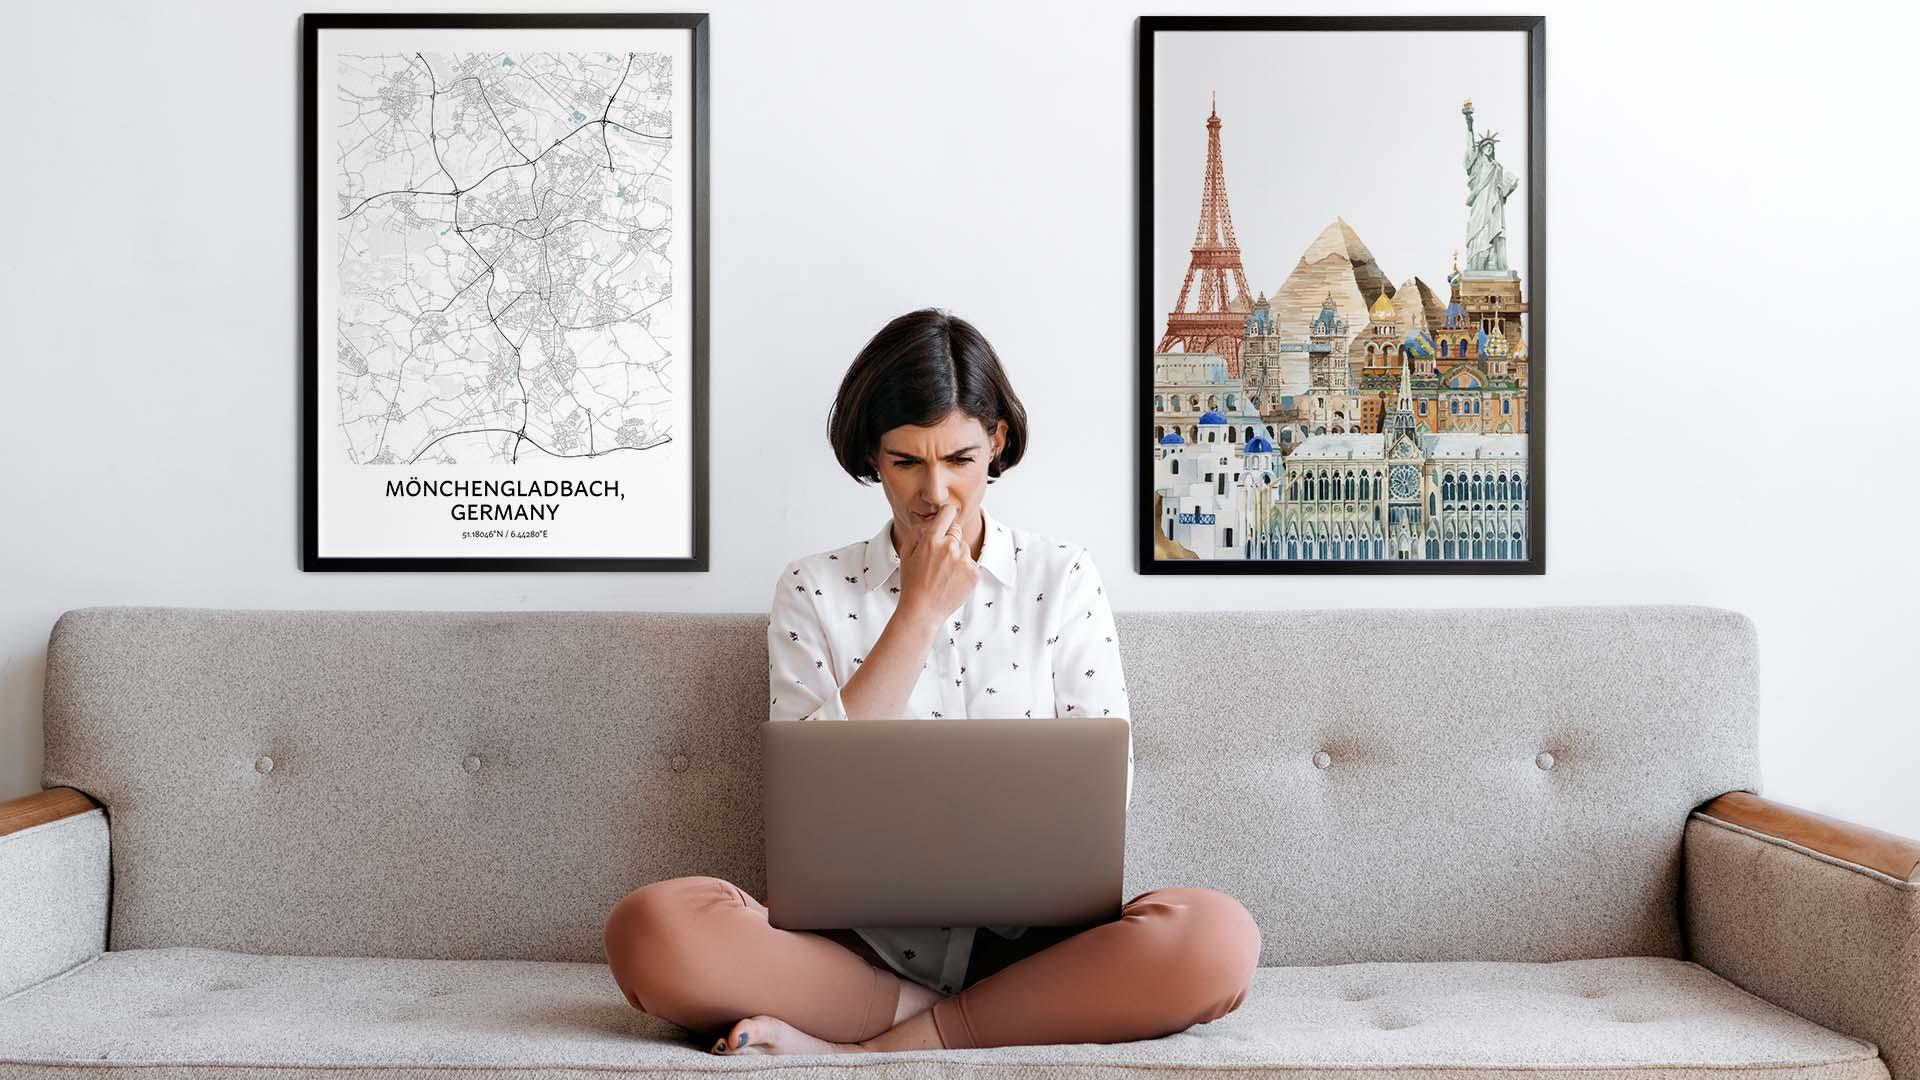 Monchengladbach city map art